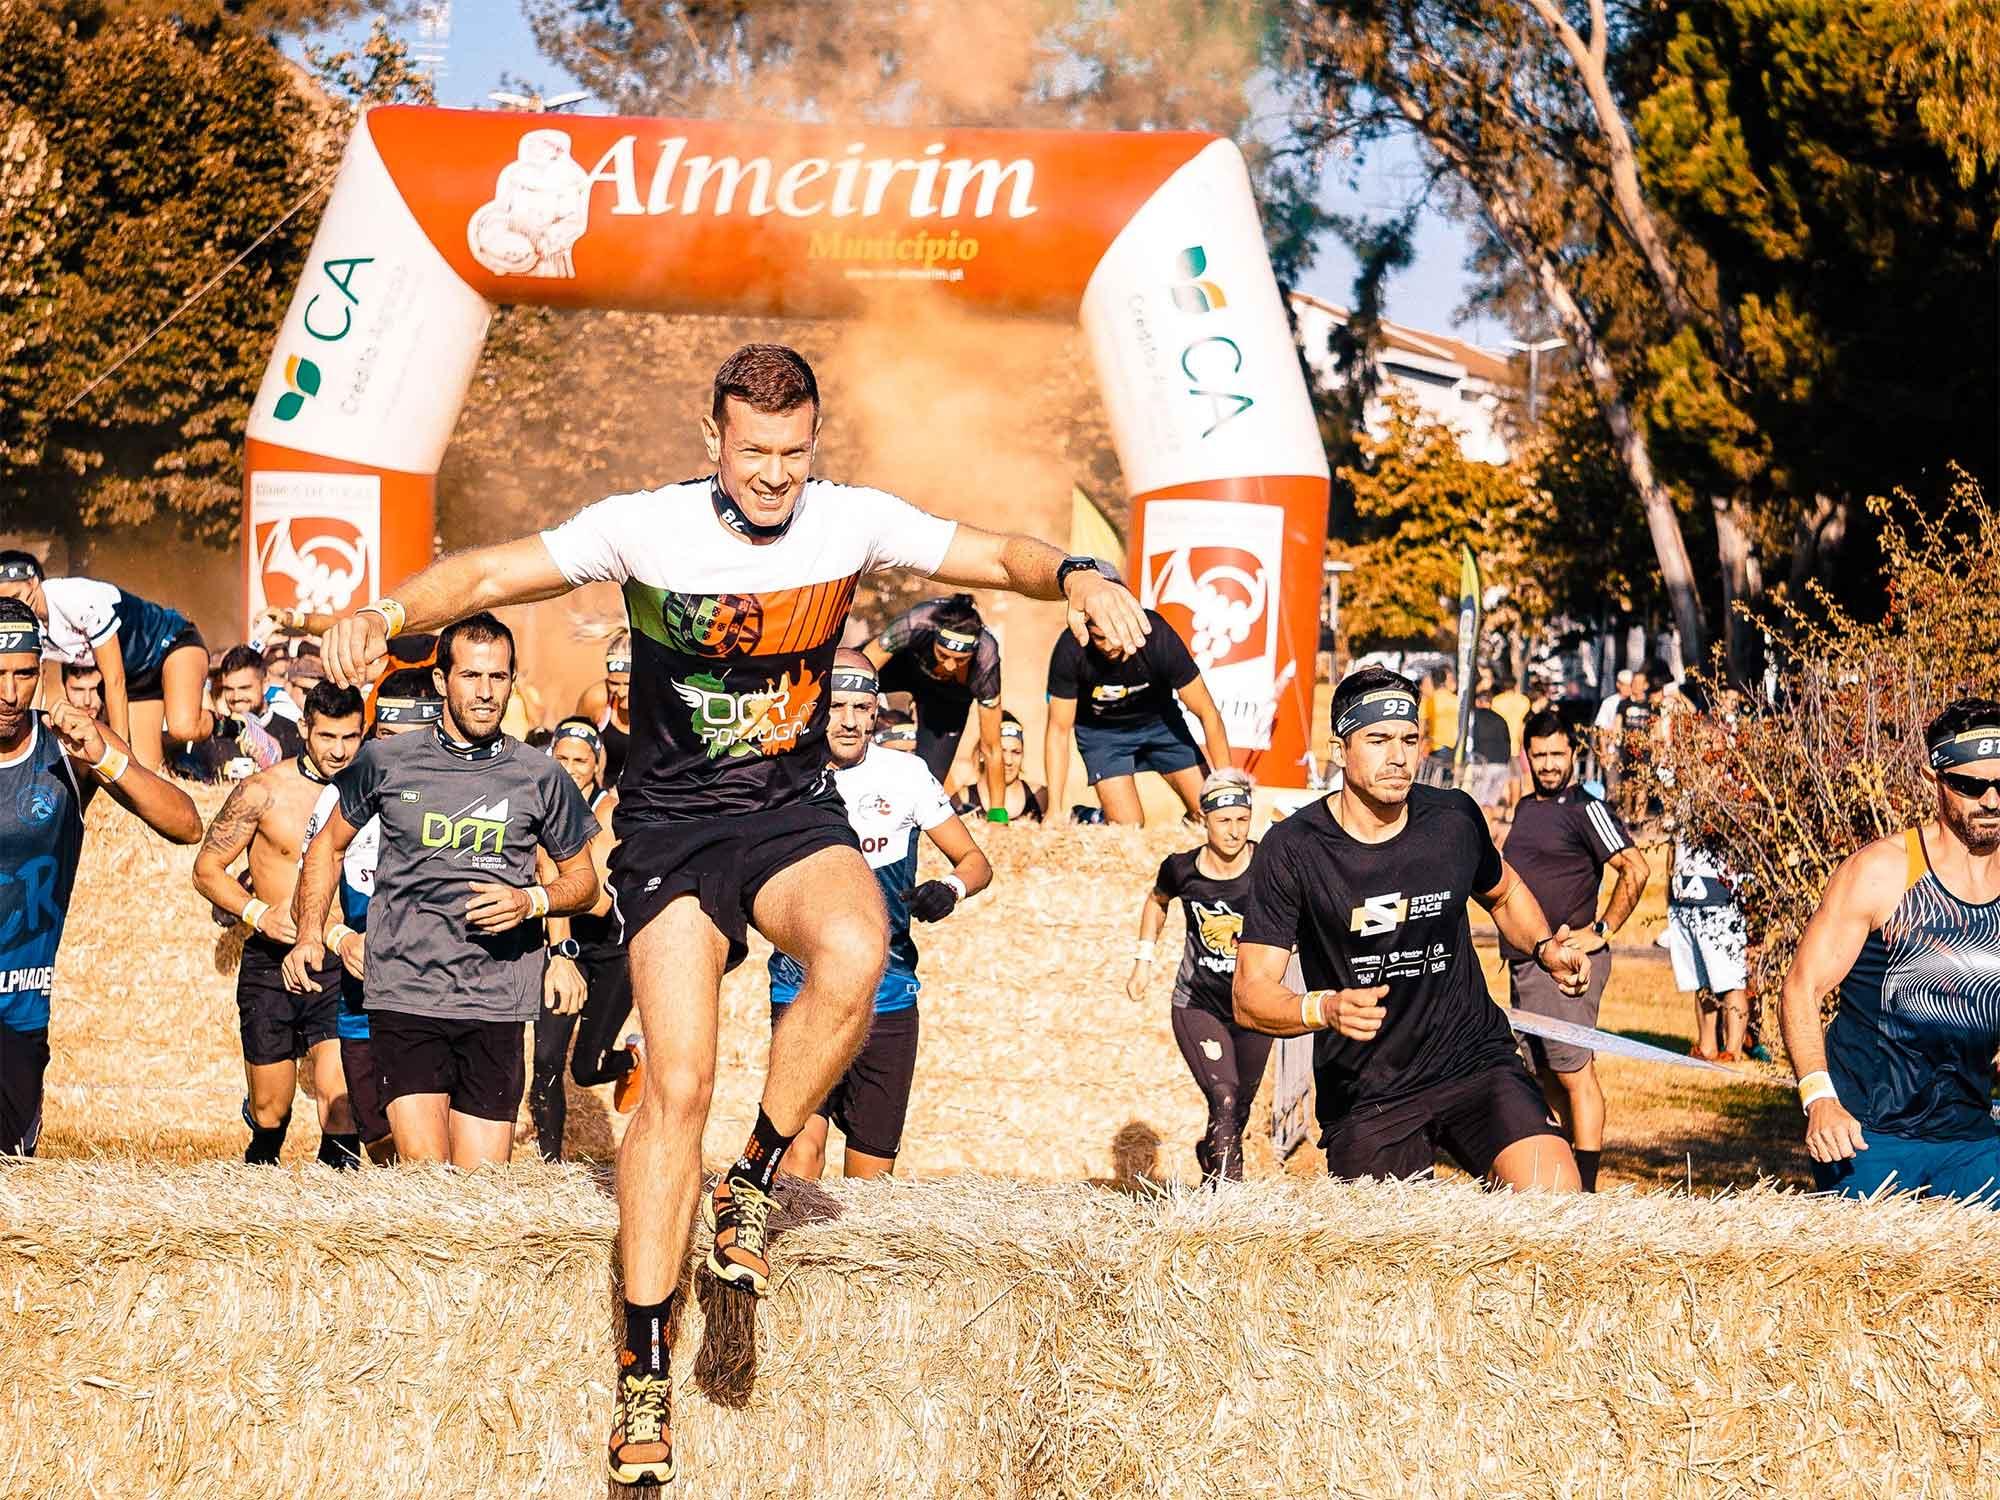 Bunch of guys running a marathon